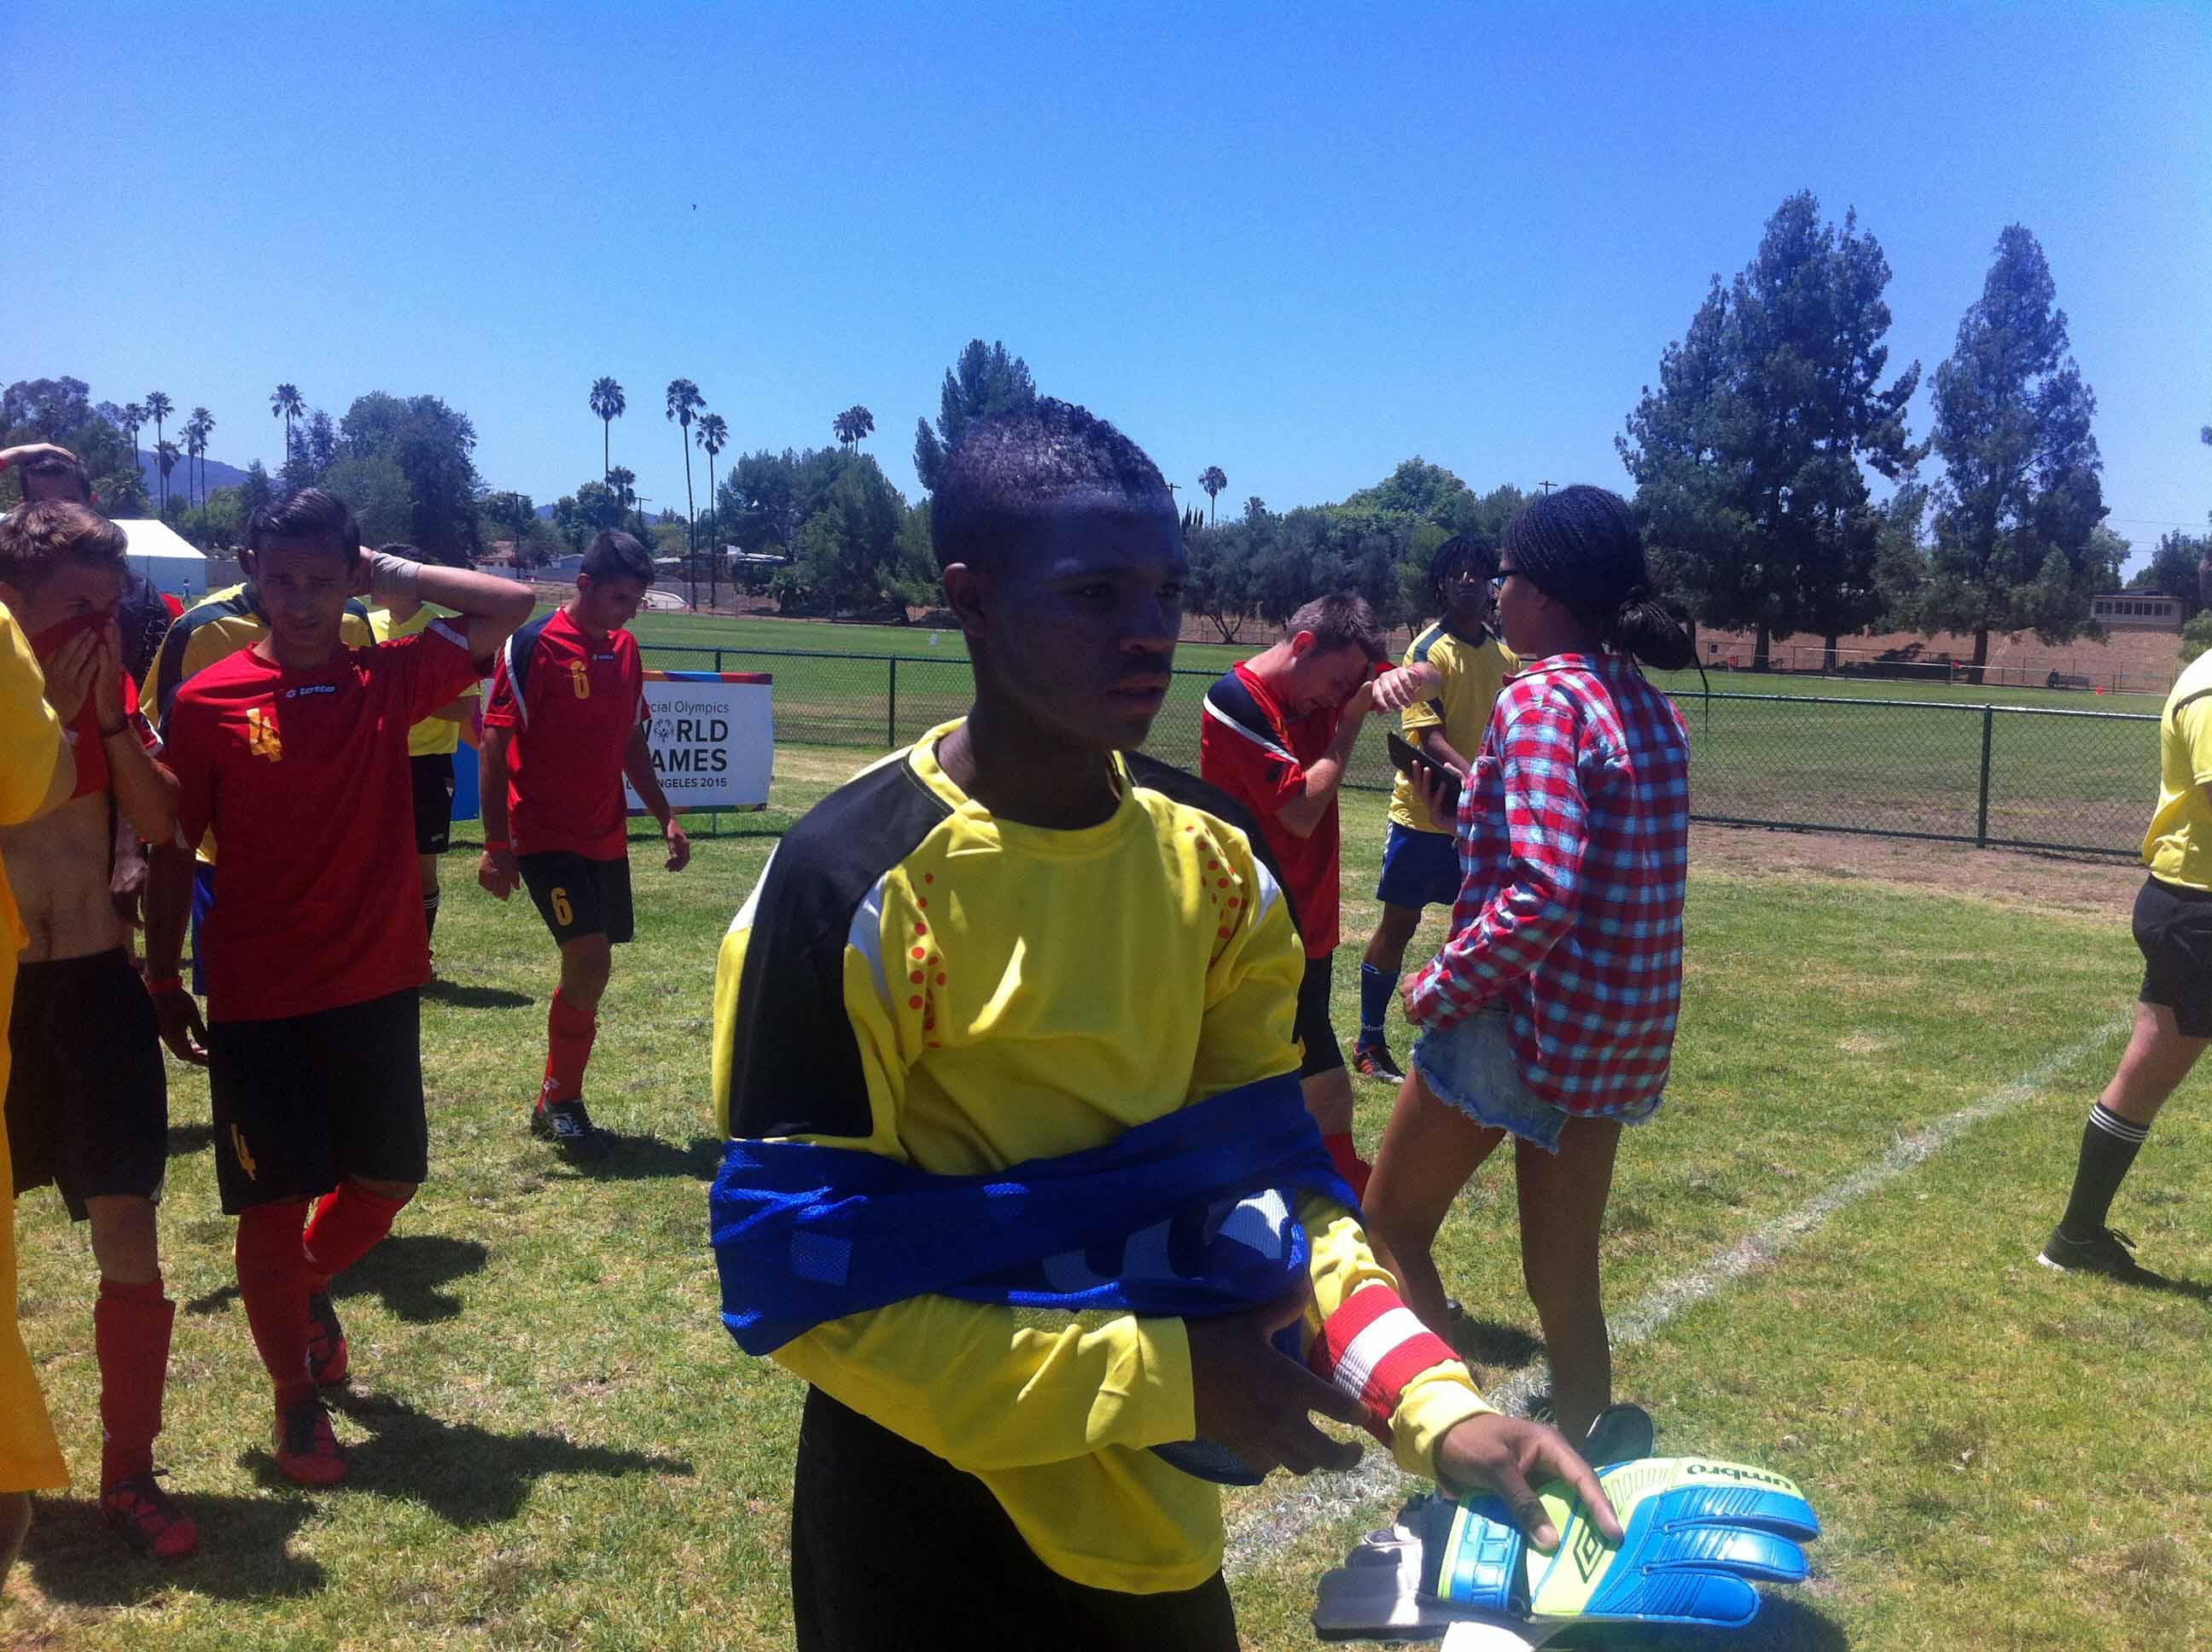 South Africa Soccer Team